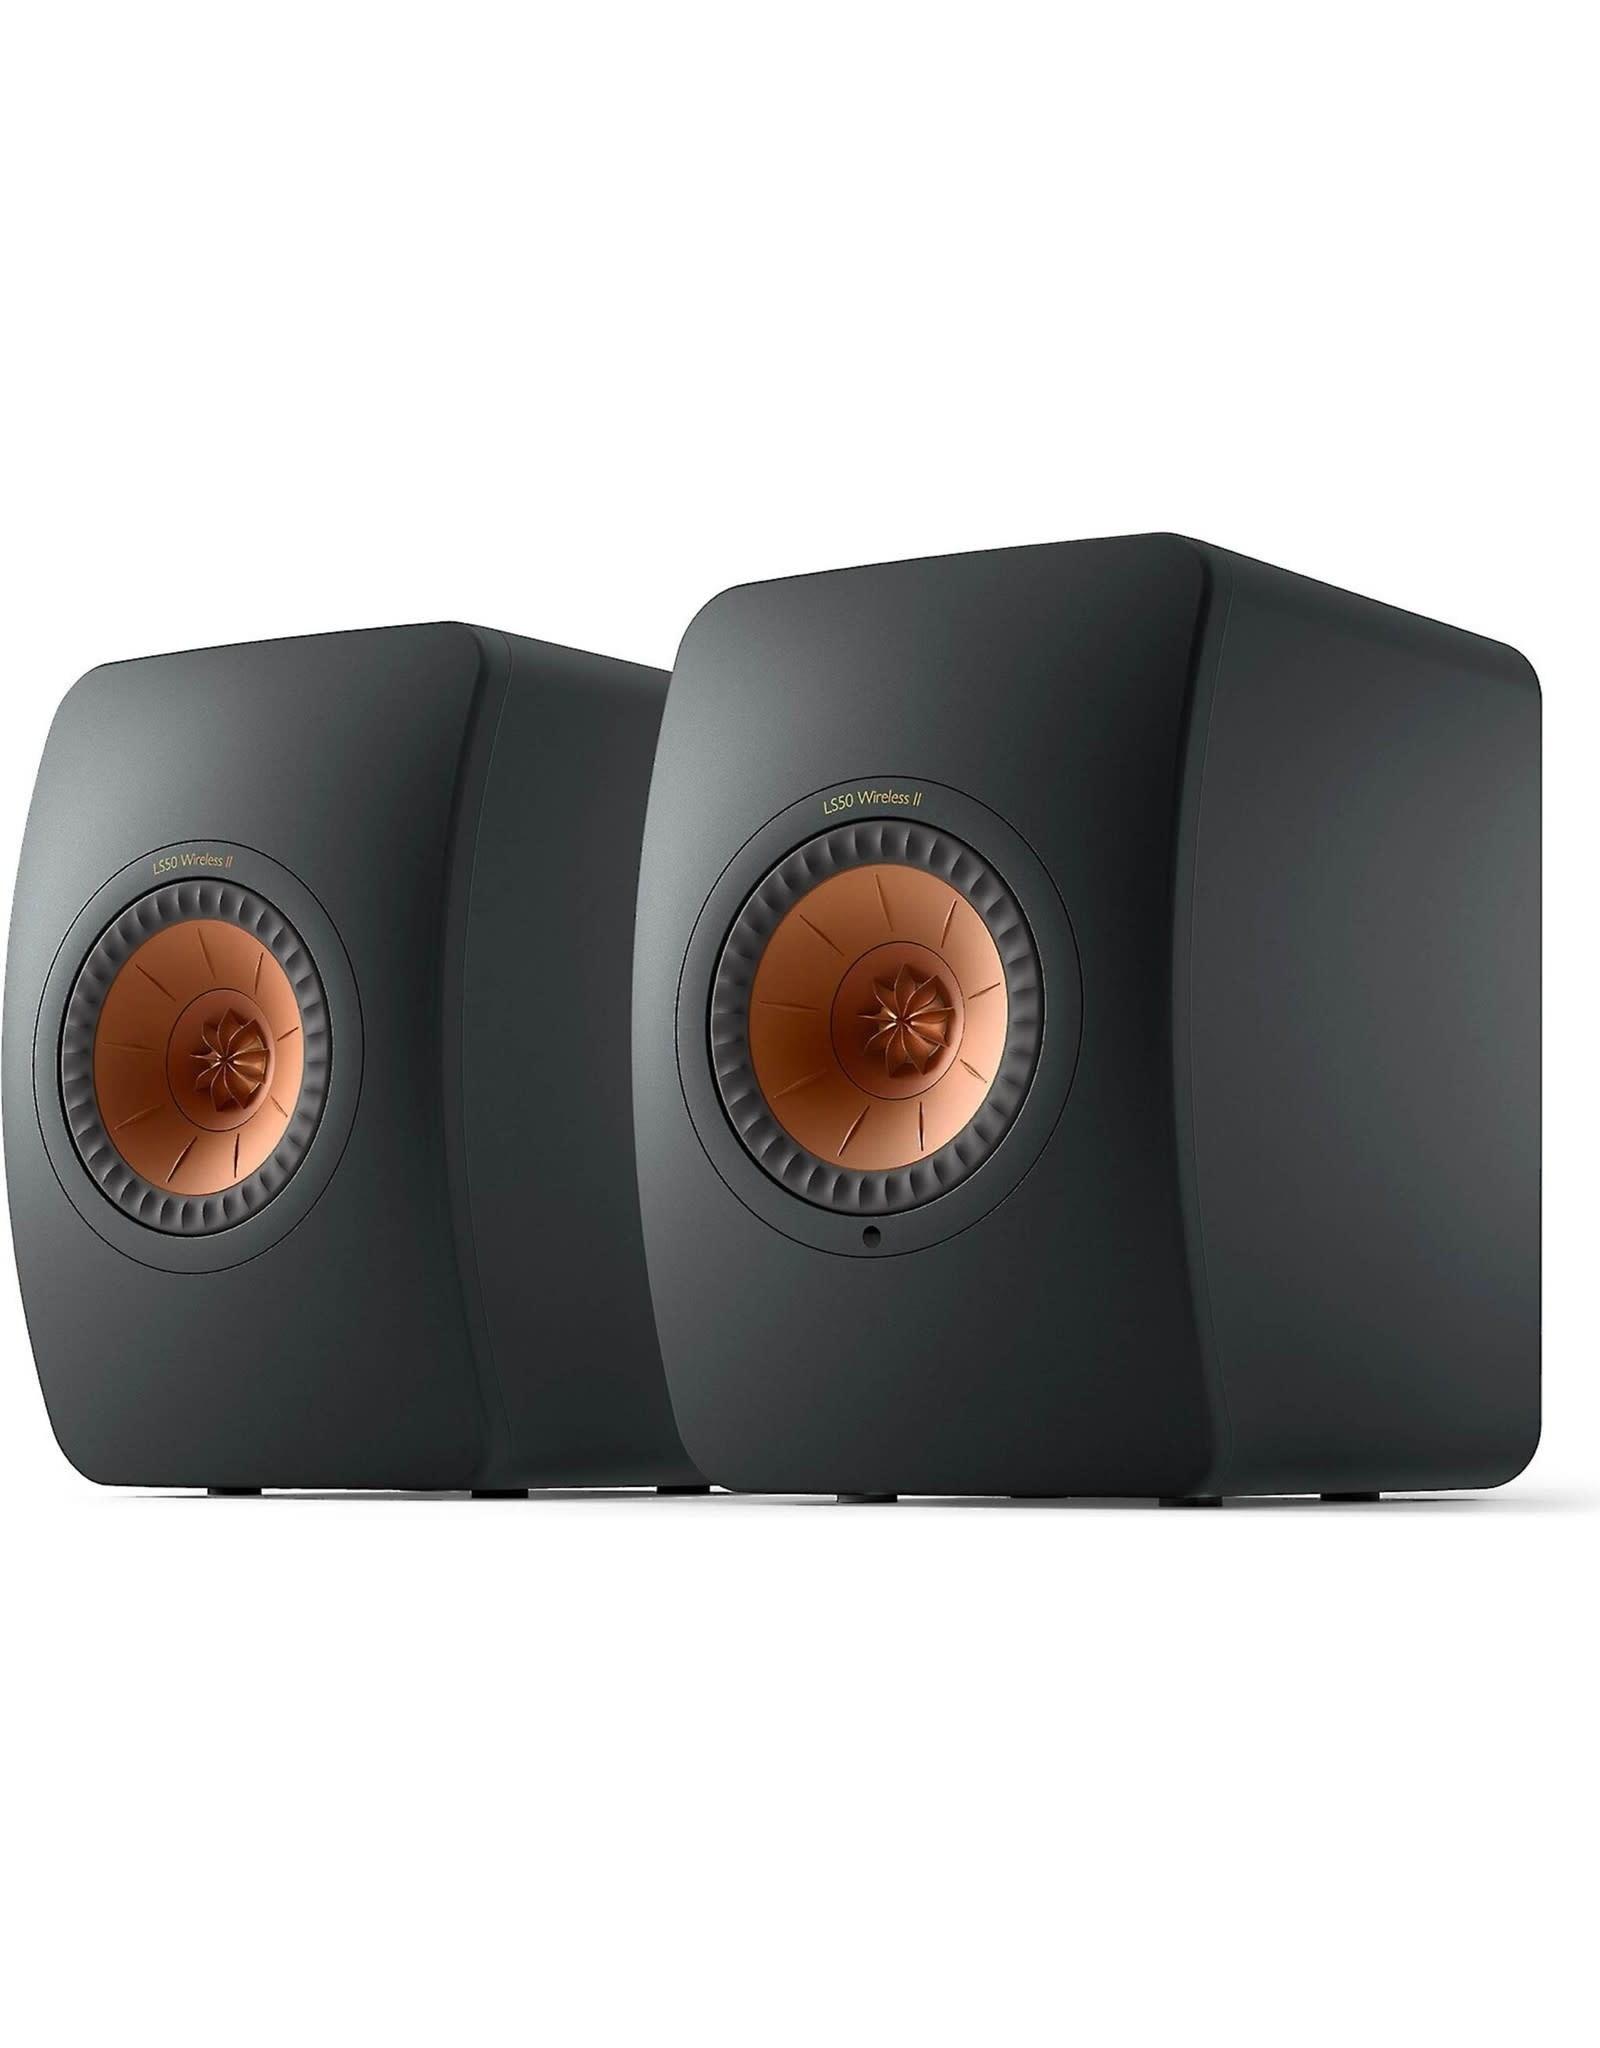 KEF KEF LS50 Wireless II Powered Bookshelf Speakers Carbon Black OPEN STOCK